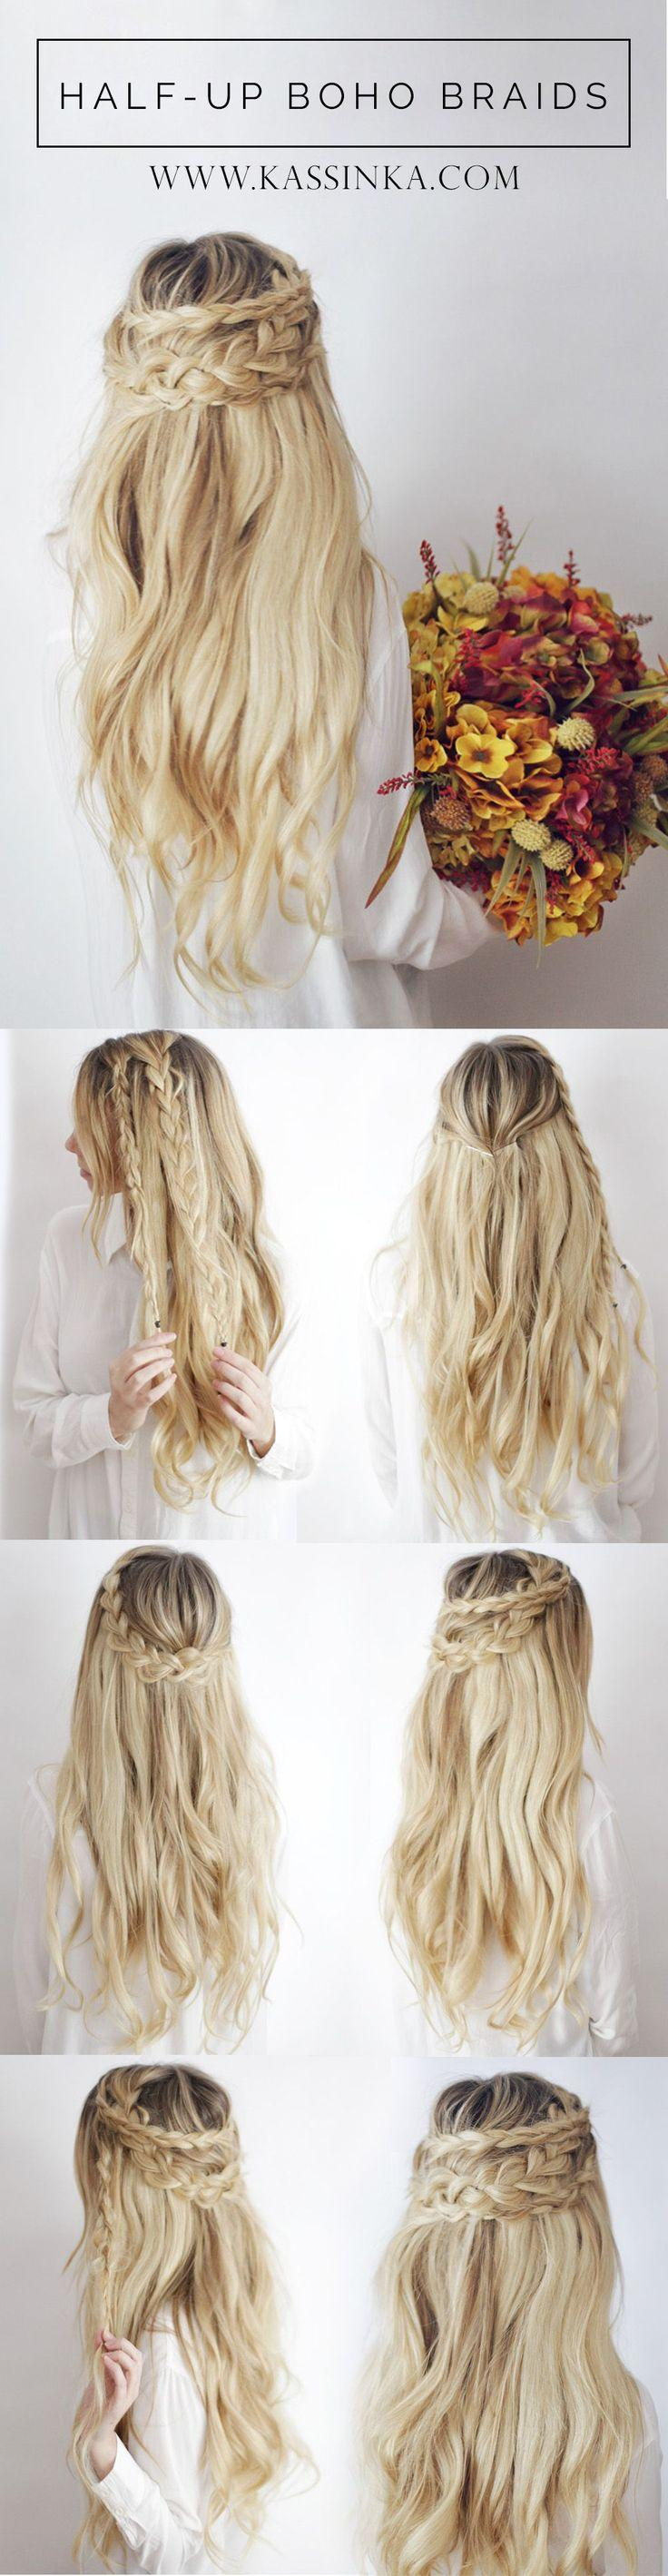 Wedding - Half-up Boho Braids ┊ Hair TutorialKassinka